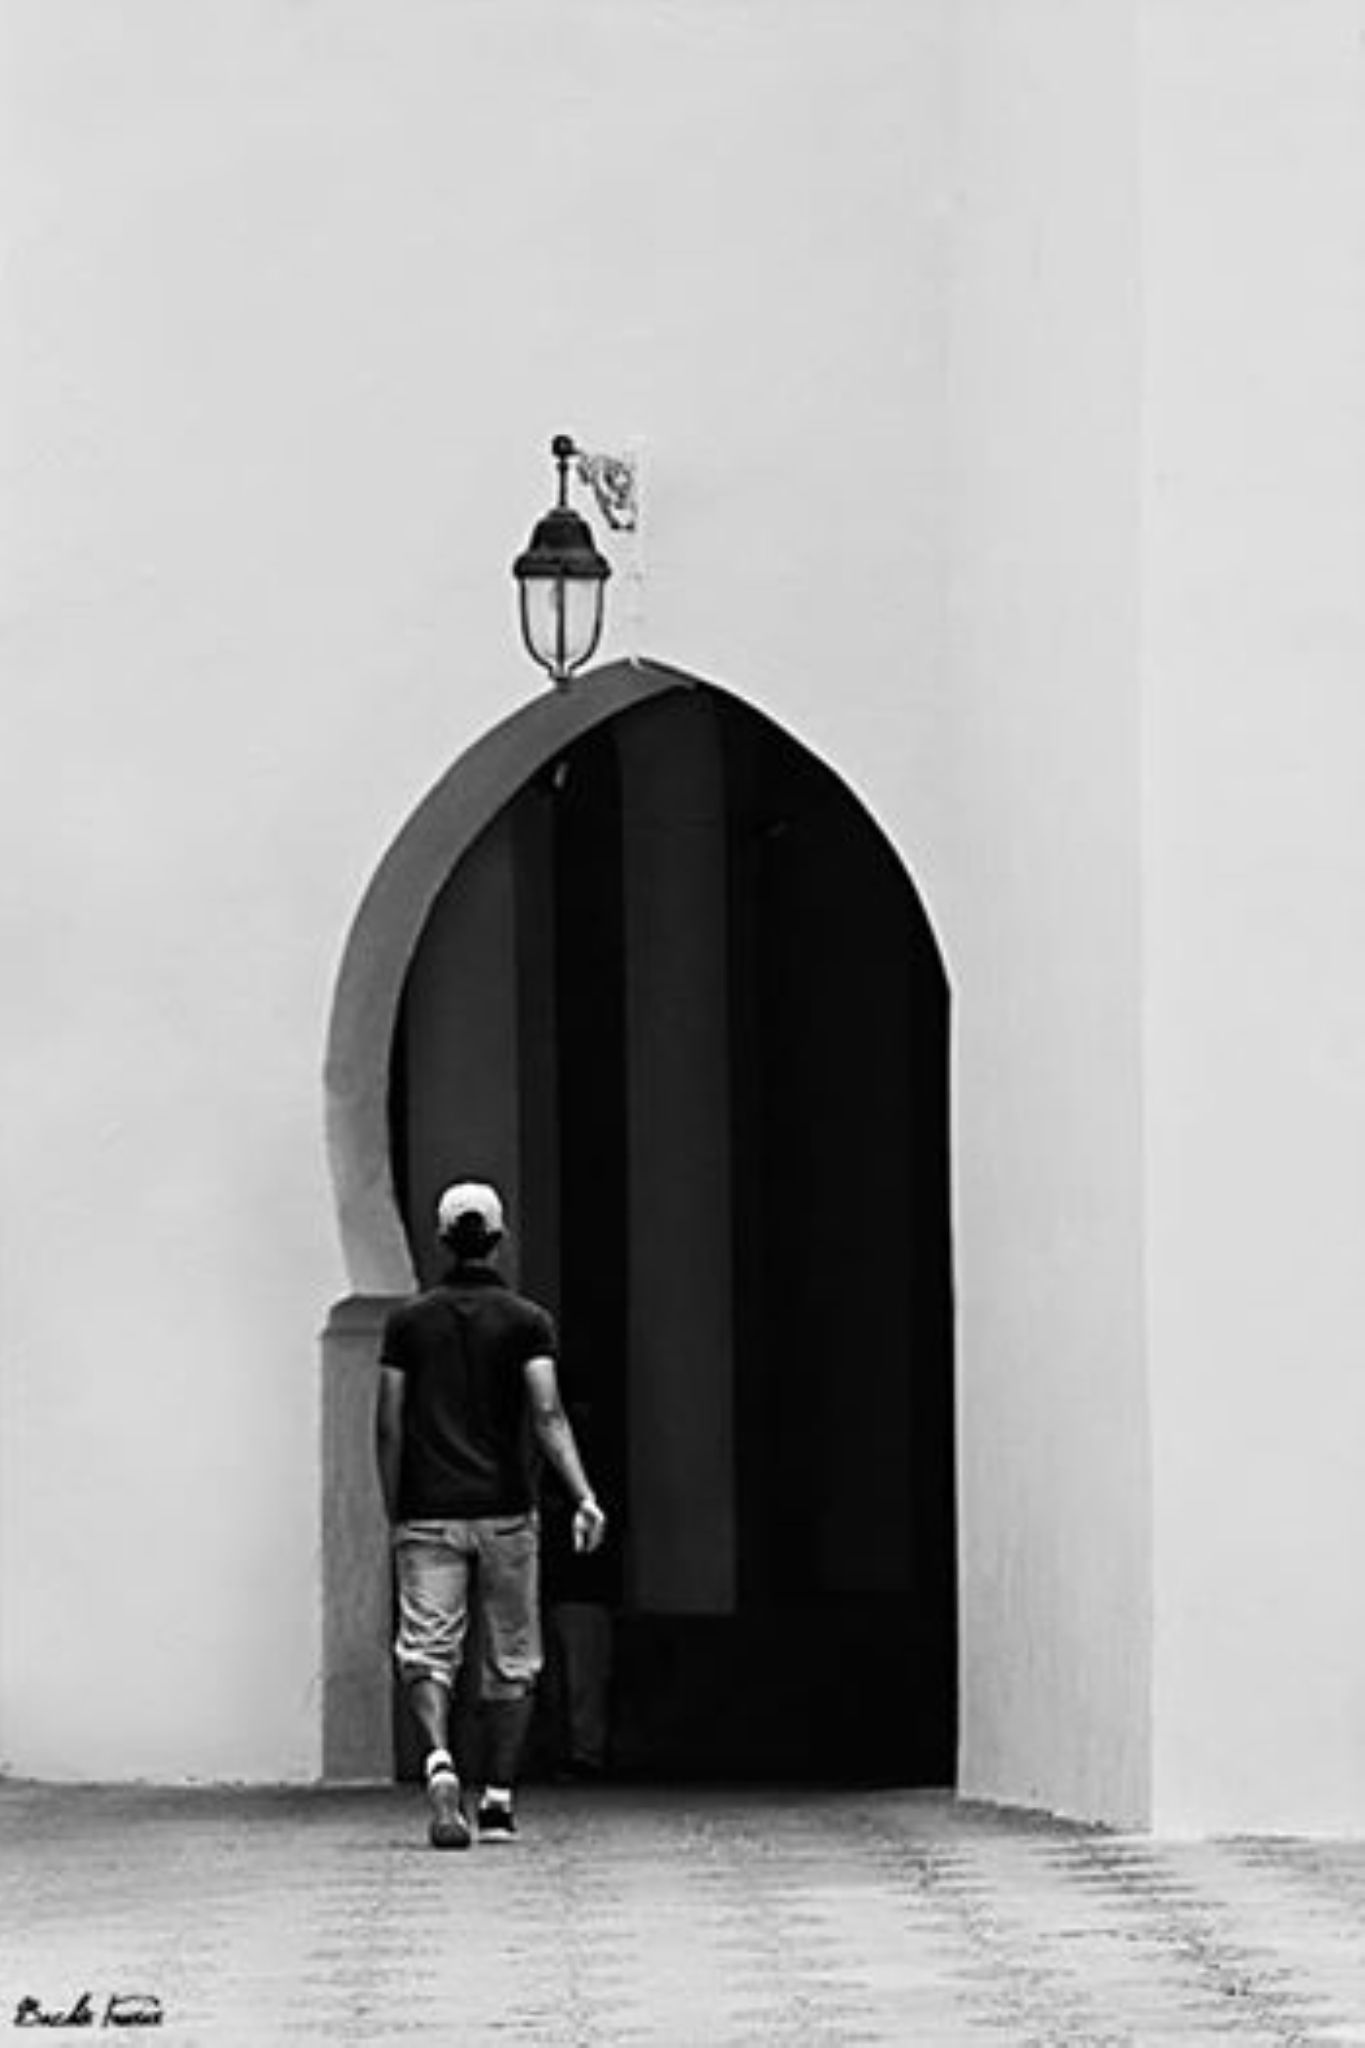 C by Bachir Fourar